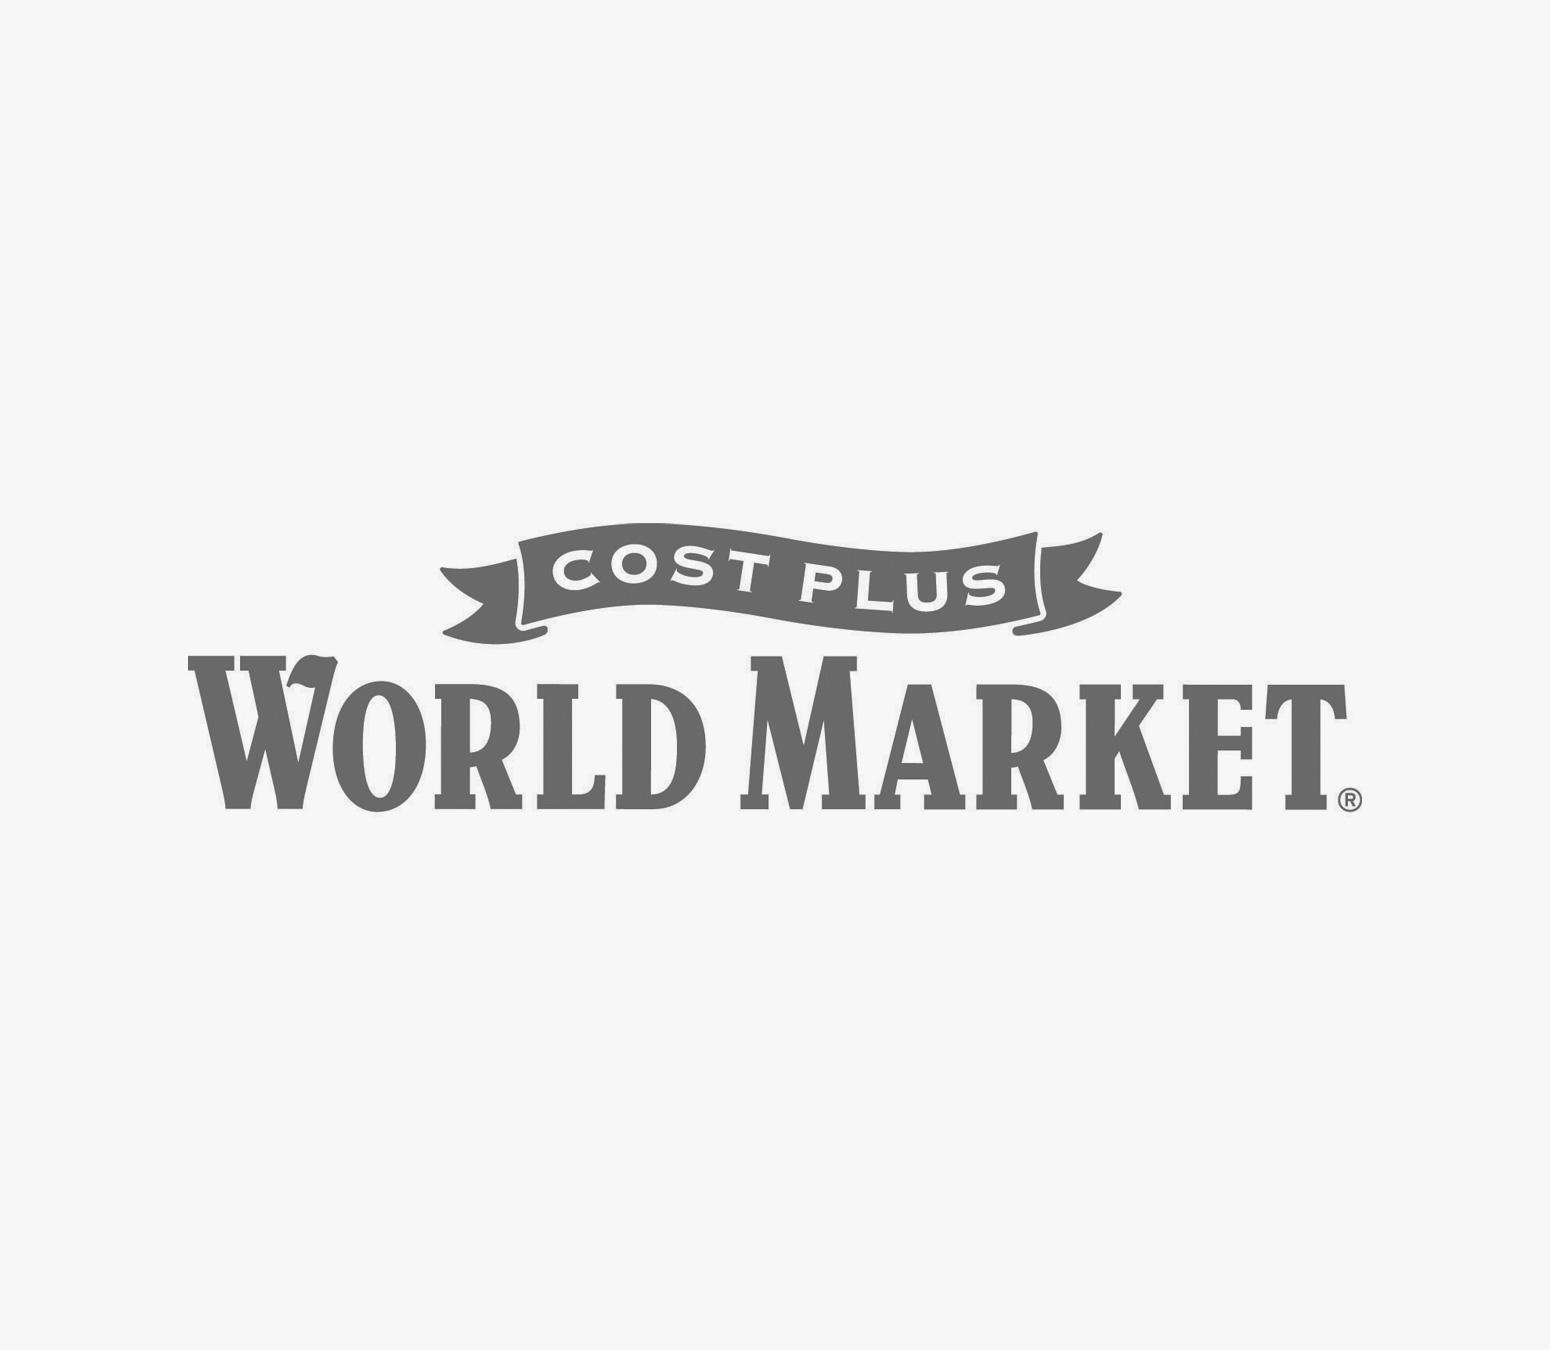 logo-costplus.jpg